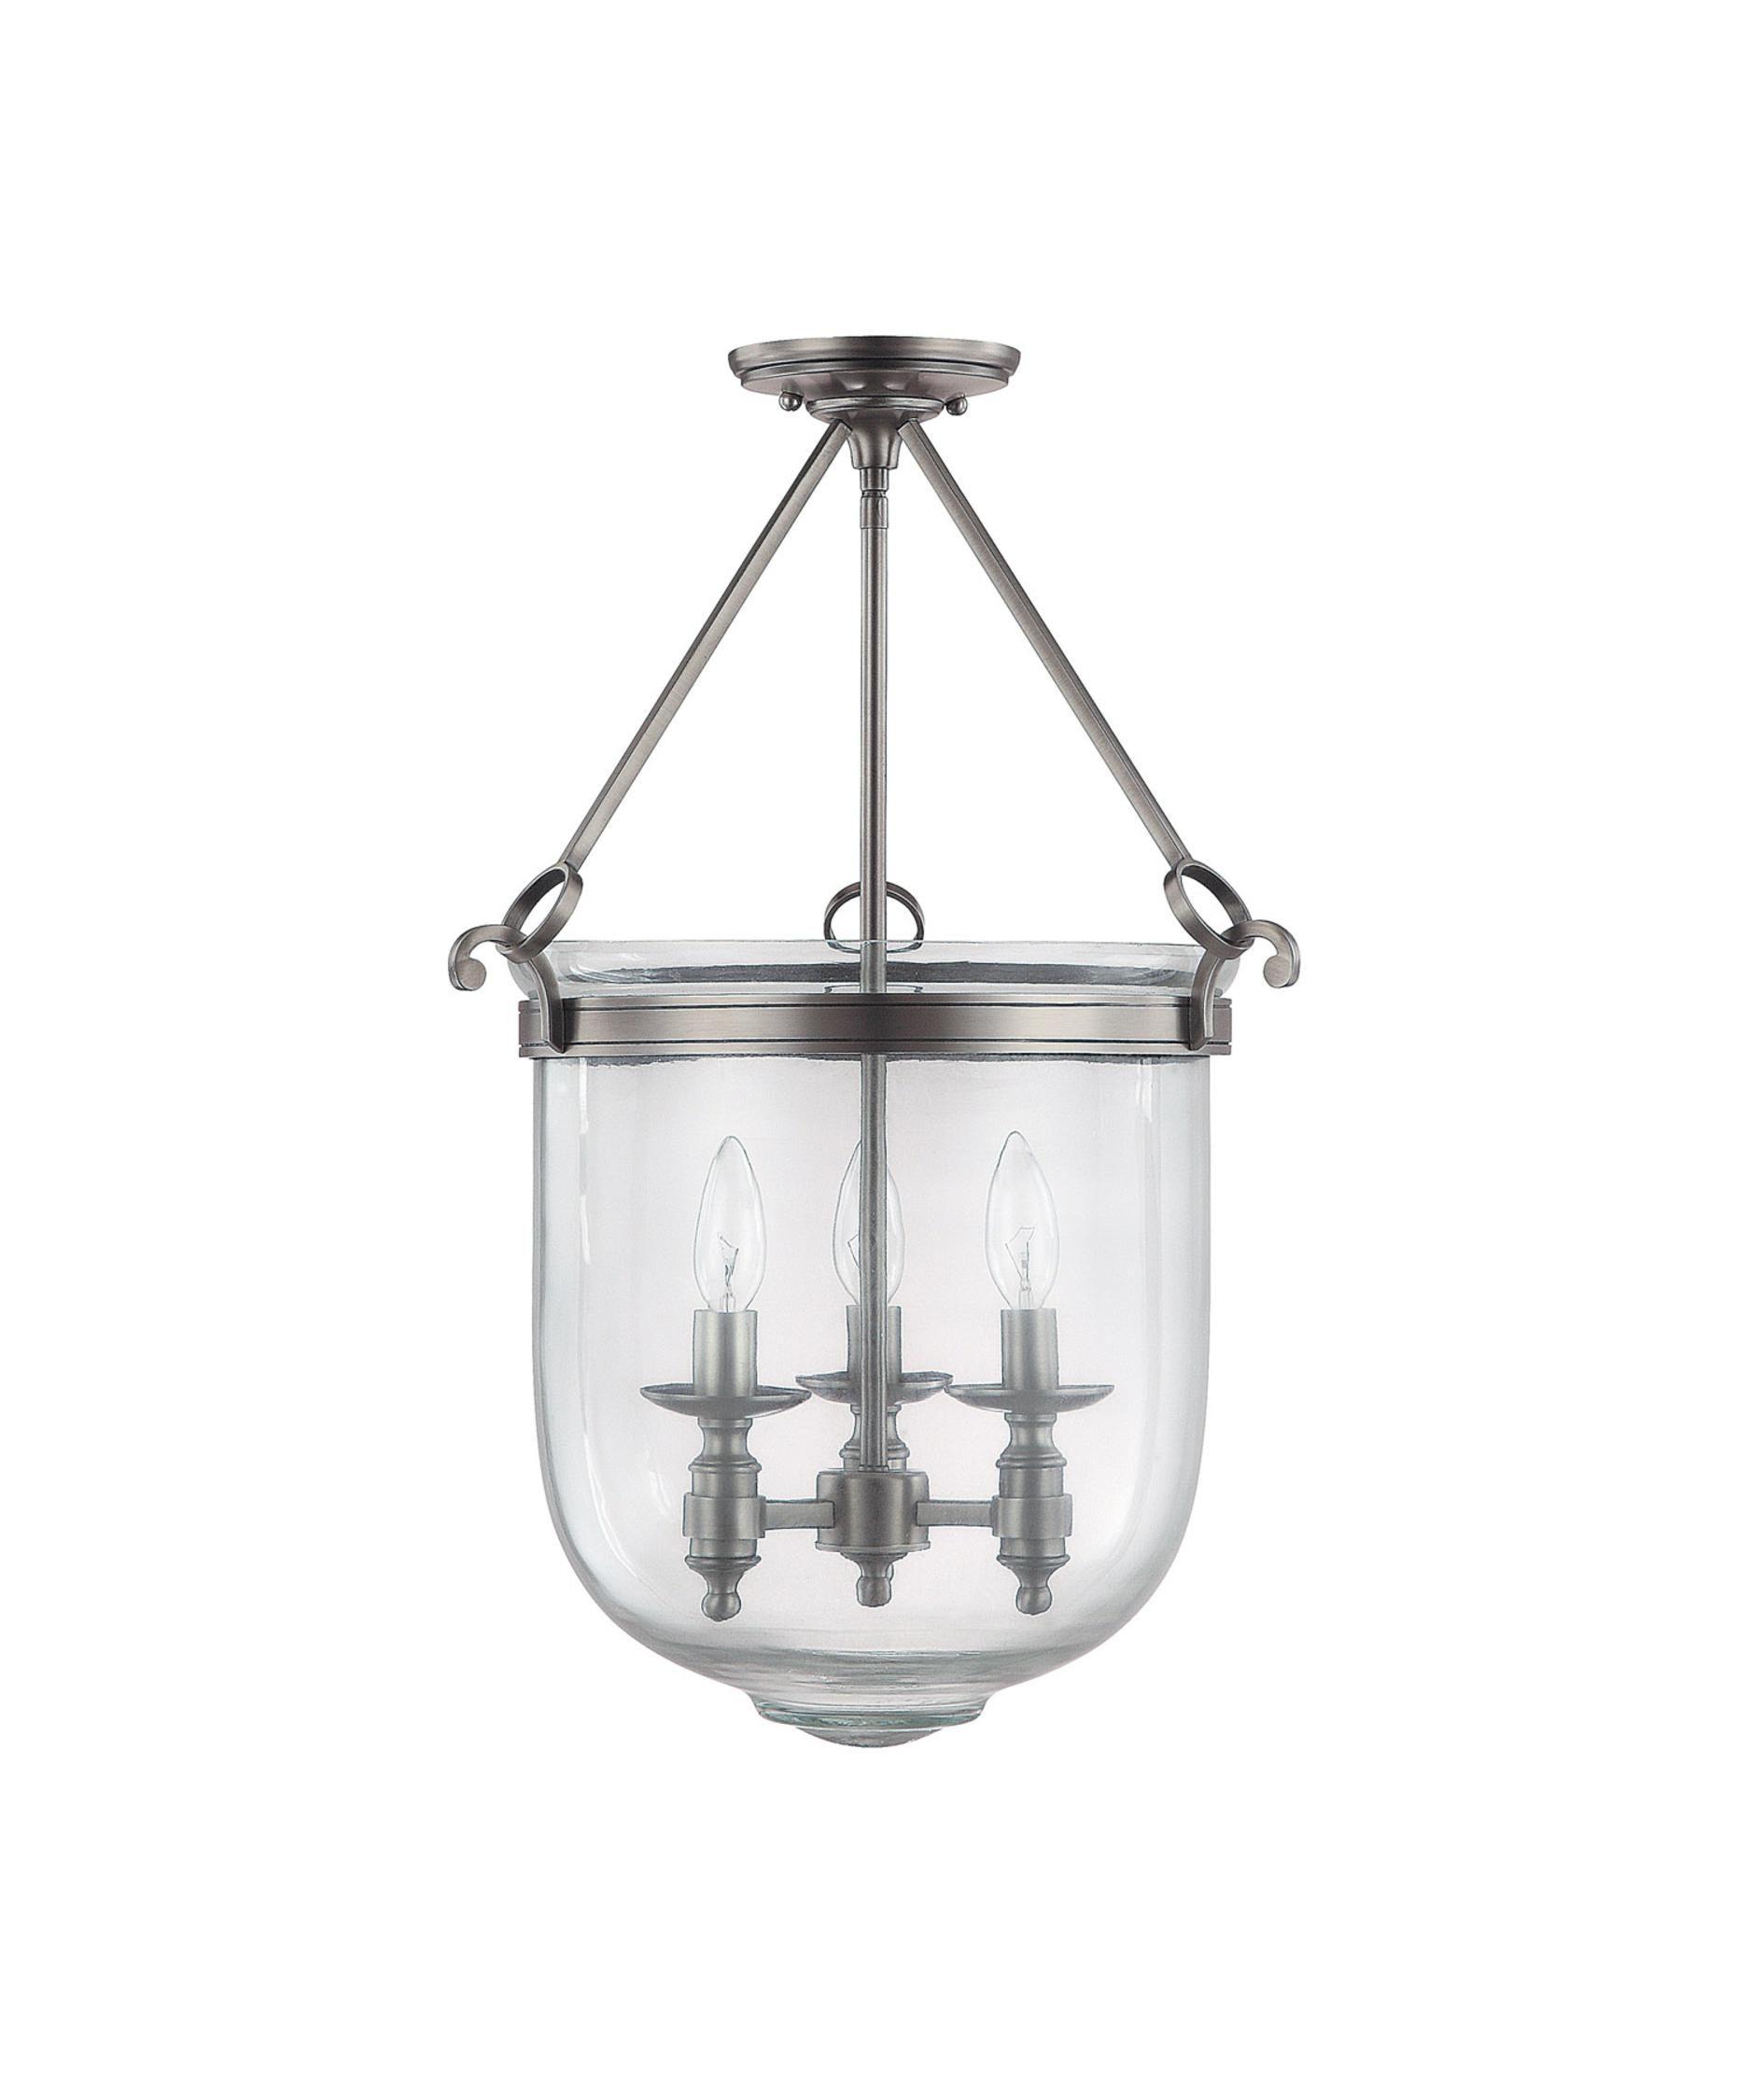 home depot pendant lighting. lantern pendant light home depot traditional capital lighting 9401 covington collection 16 inch foyer vision